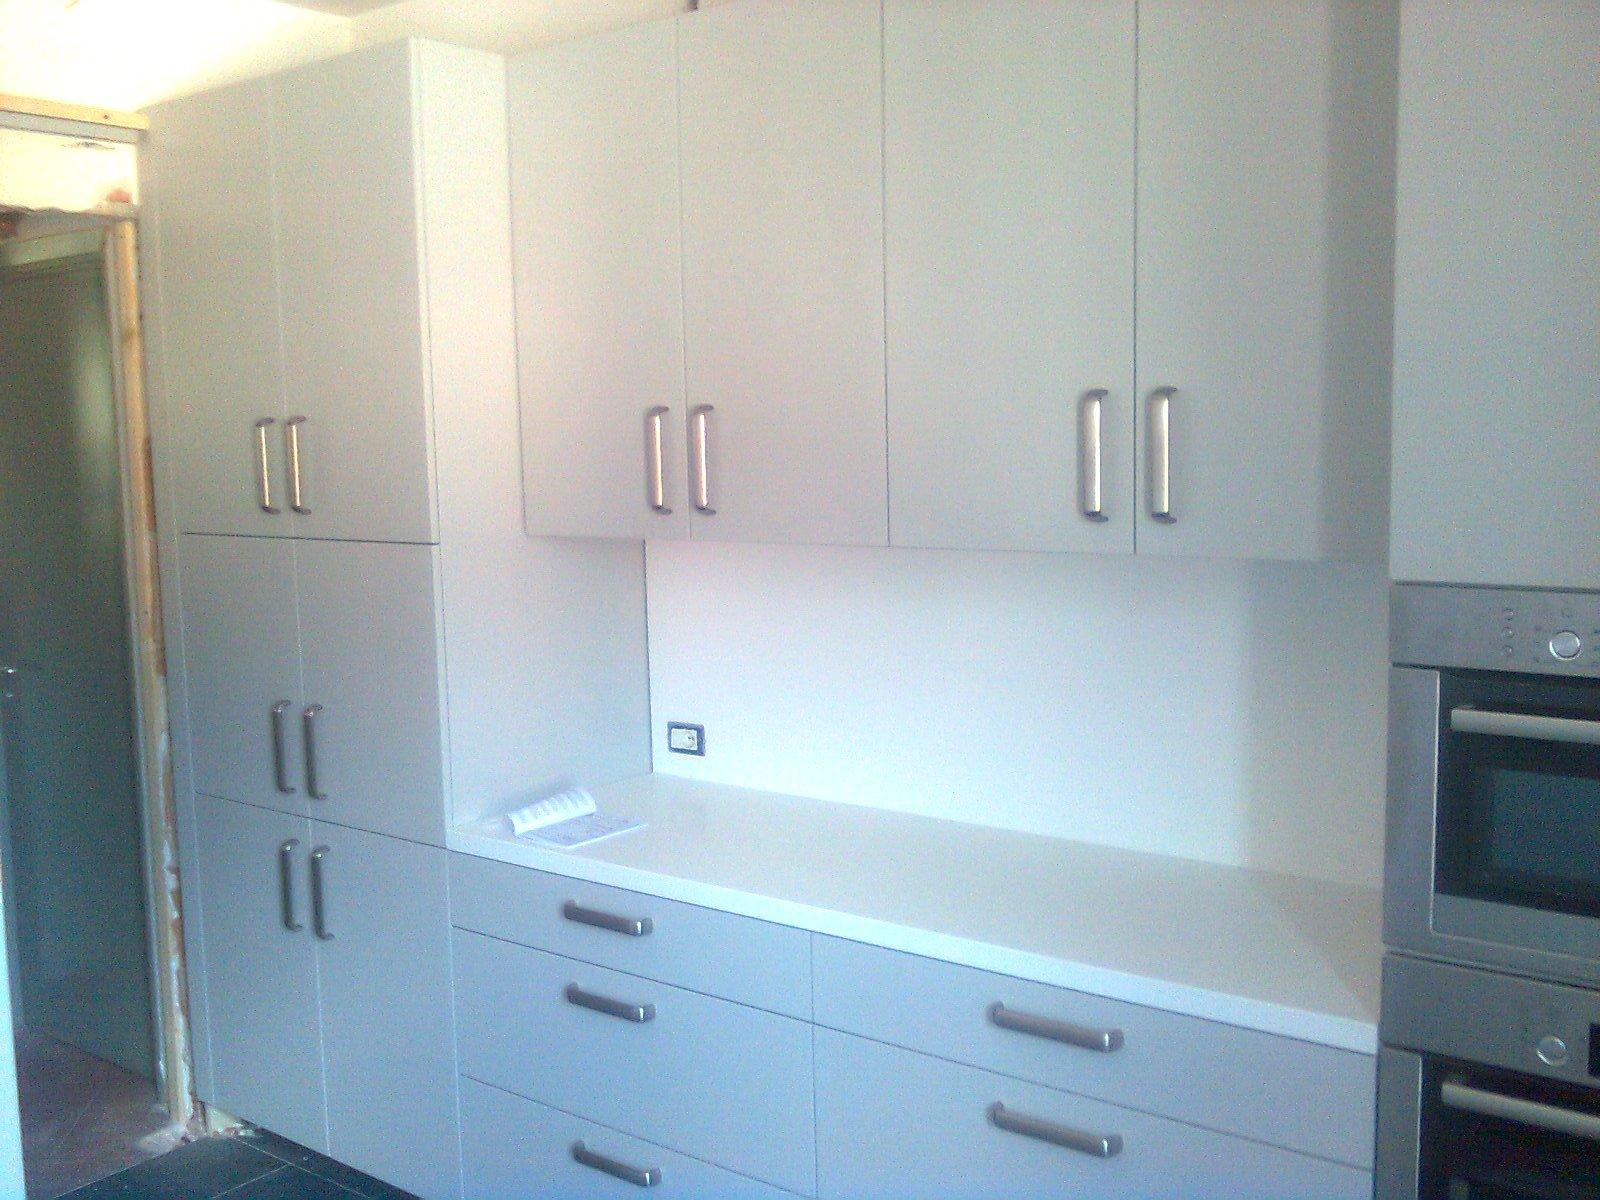 mobili cucina arredo legno 7